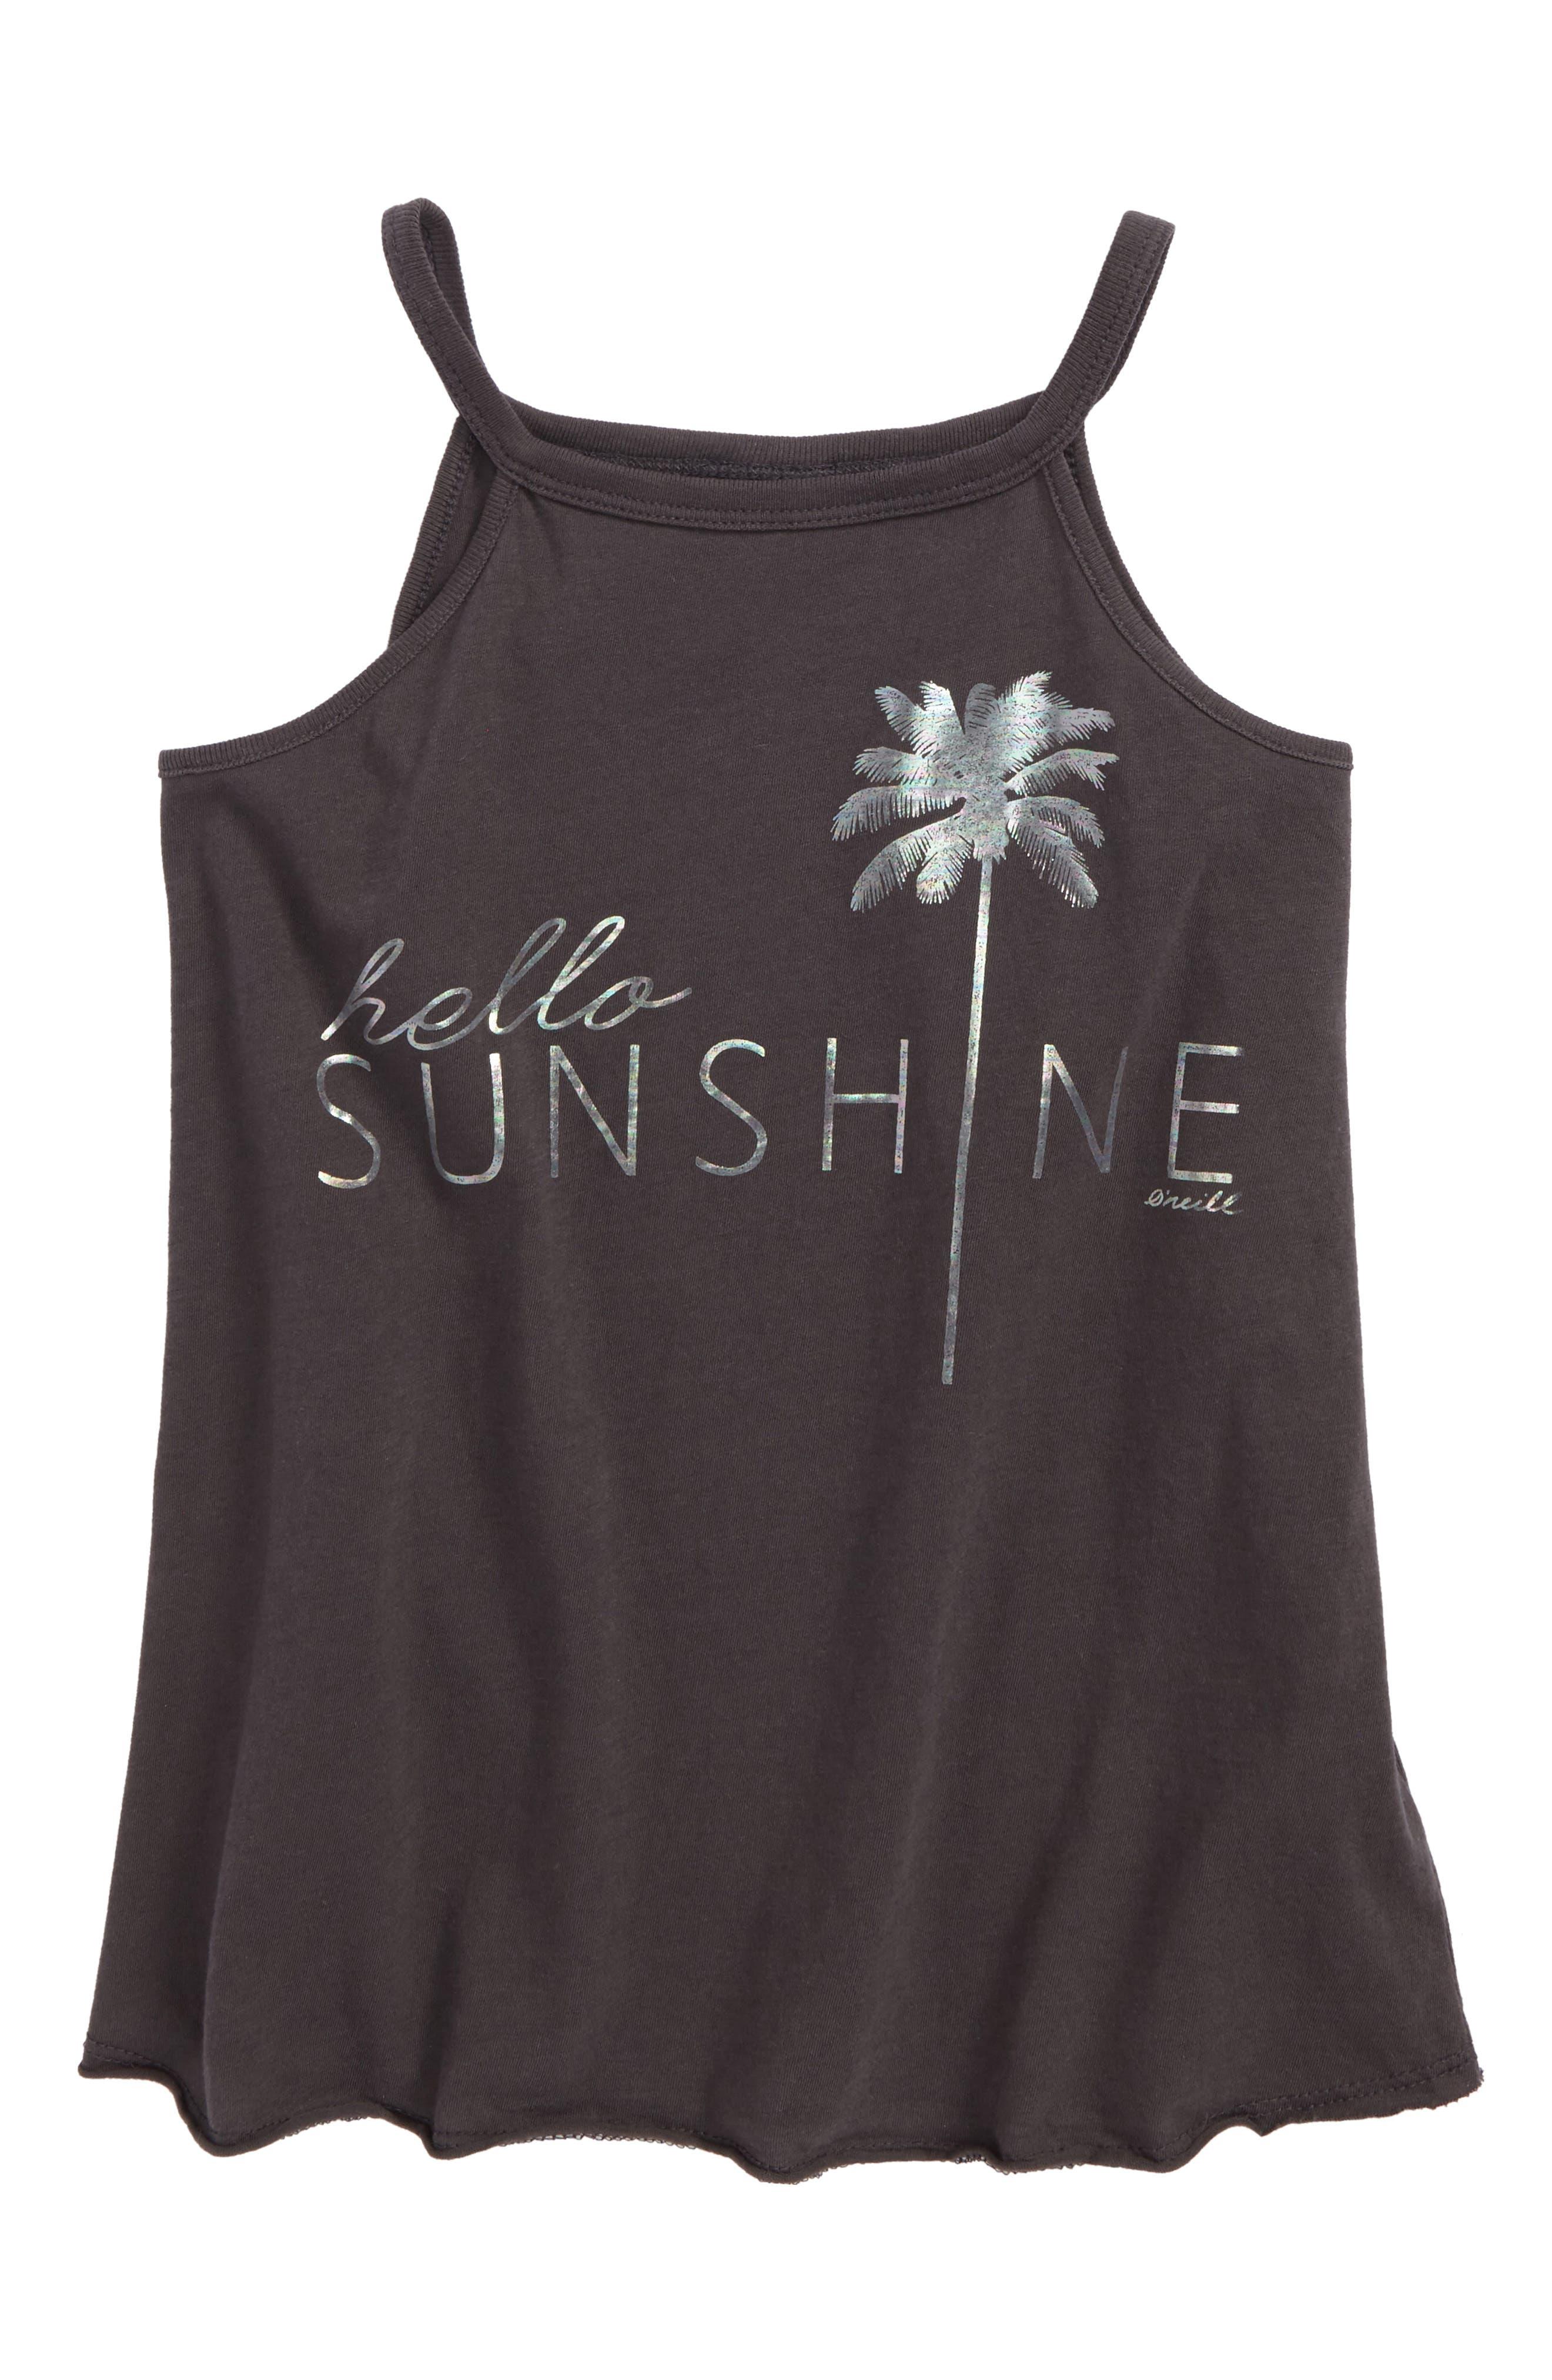 Hello Sunshine Graphic Tank,                             Main thumbnail 1, color,                             Washed Black - Fad